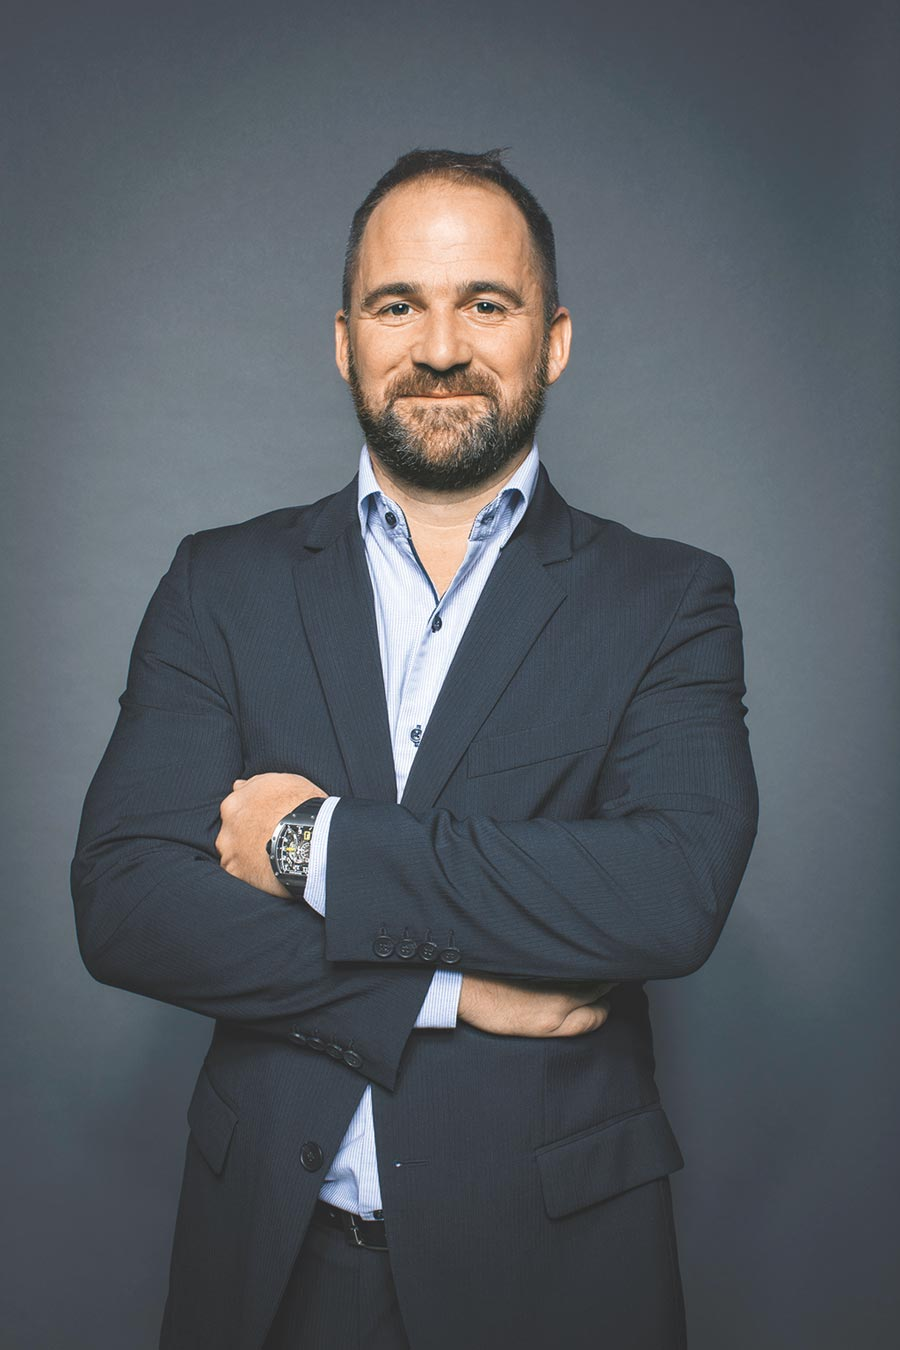 RICHARD MILLE技術總監Julien Boillat認為RM 33-02腕表,展現時尚與運動風巧妙相融的美學品味。(RICHARD MILLE提供)